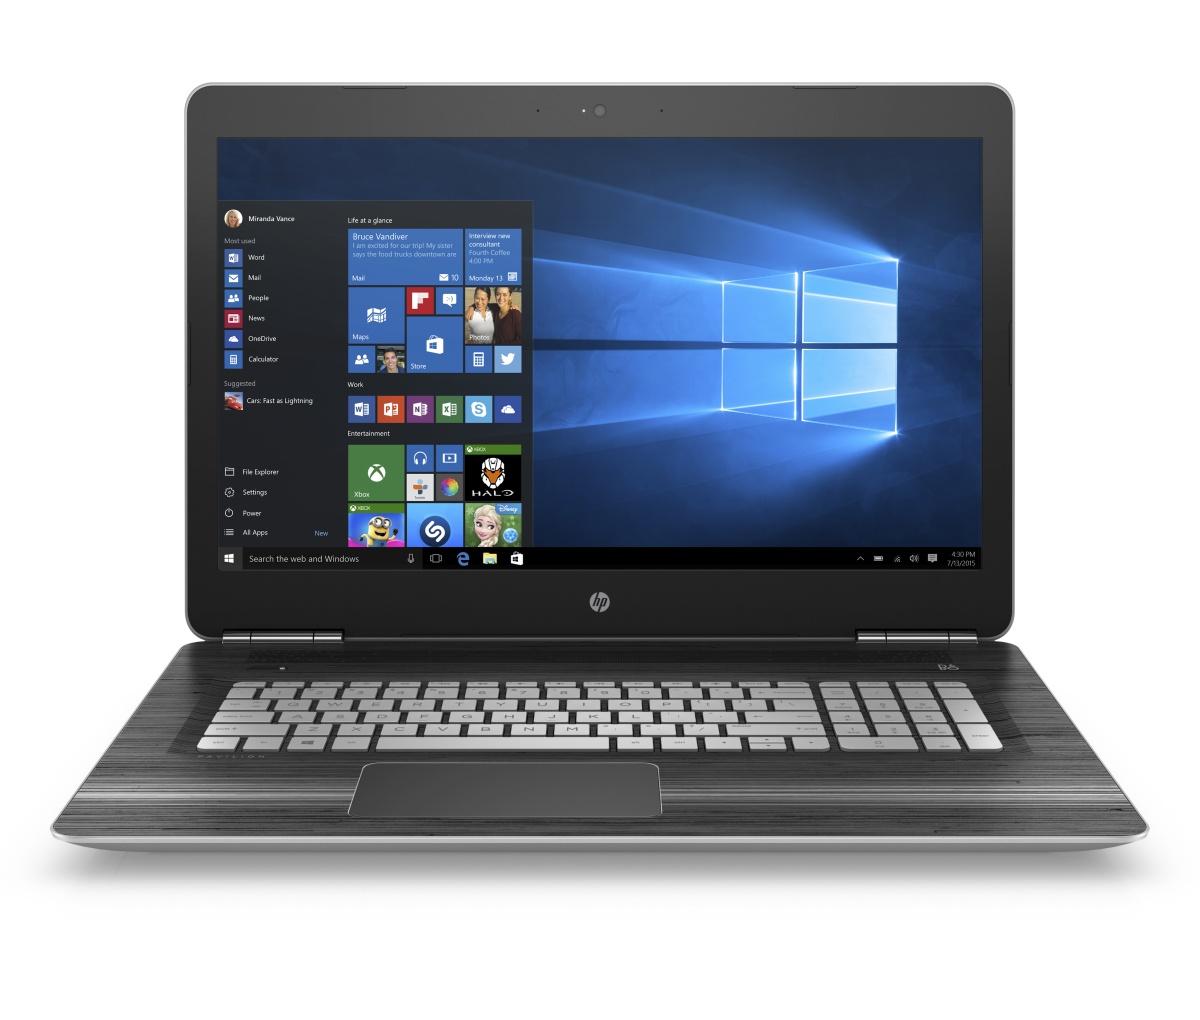 "HP Pavilion gaming 17-ab200nc/Intel i5-7300HQ/8GB/128 GB SSD M.2 + 1TB/DVDRW/ GTX 1050 4GB/17,3"" FHD/Win 10/stříbrná"